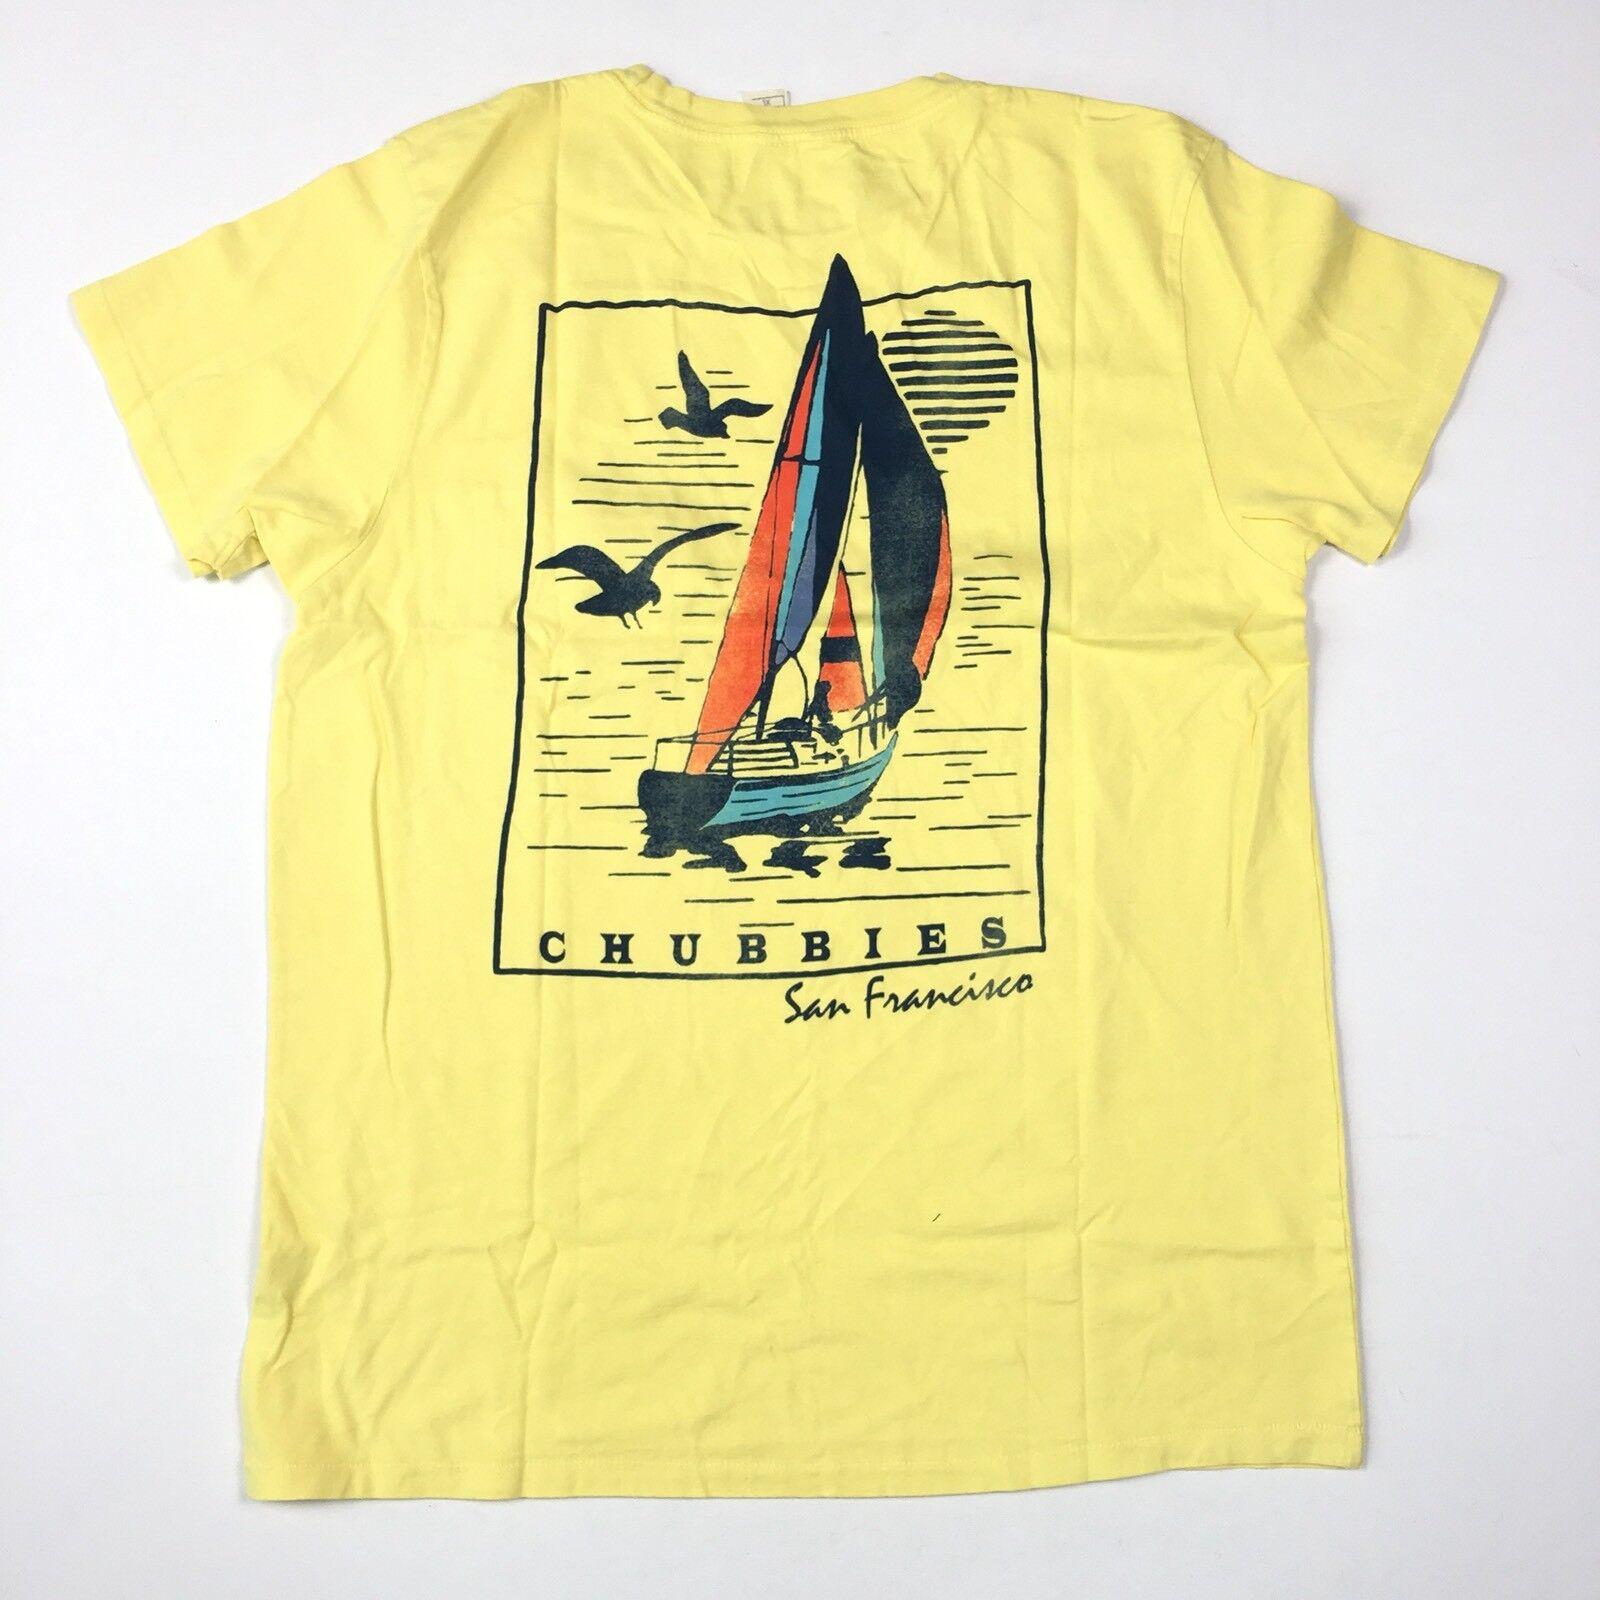 Chubbies Shorts Vintage Tasche T-Shirt Segeln XL Gelb San Francisco